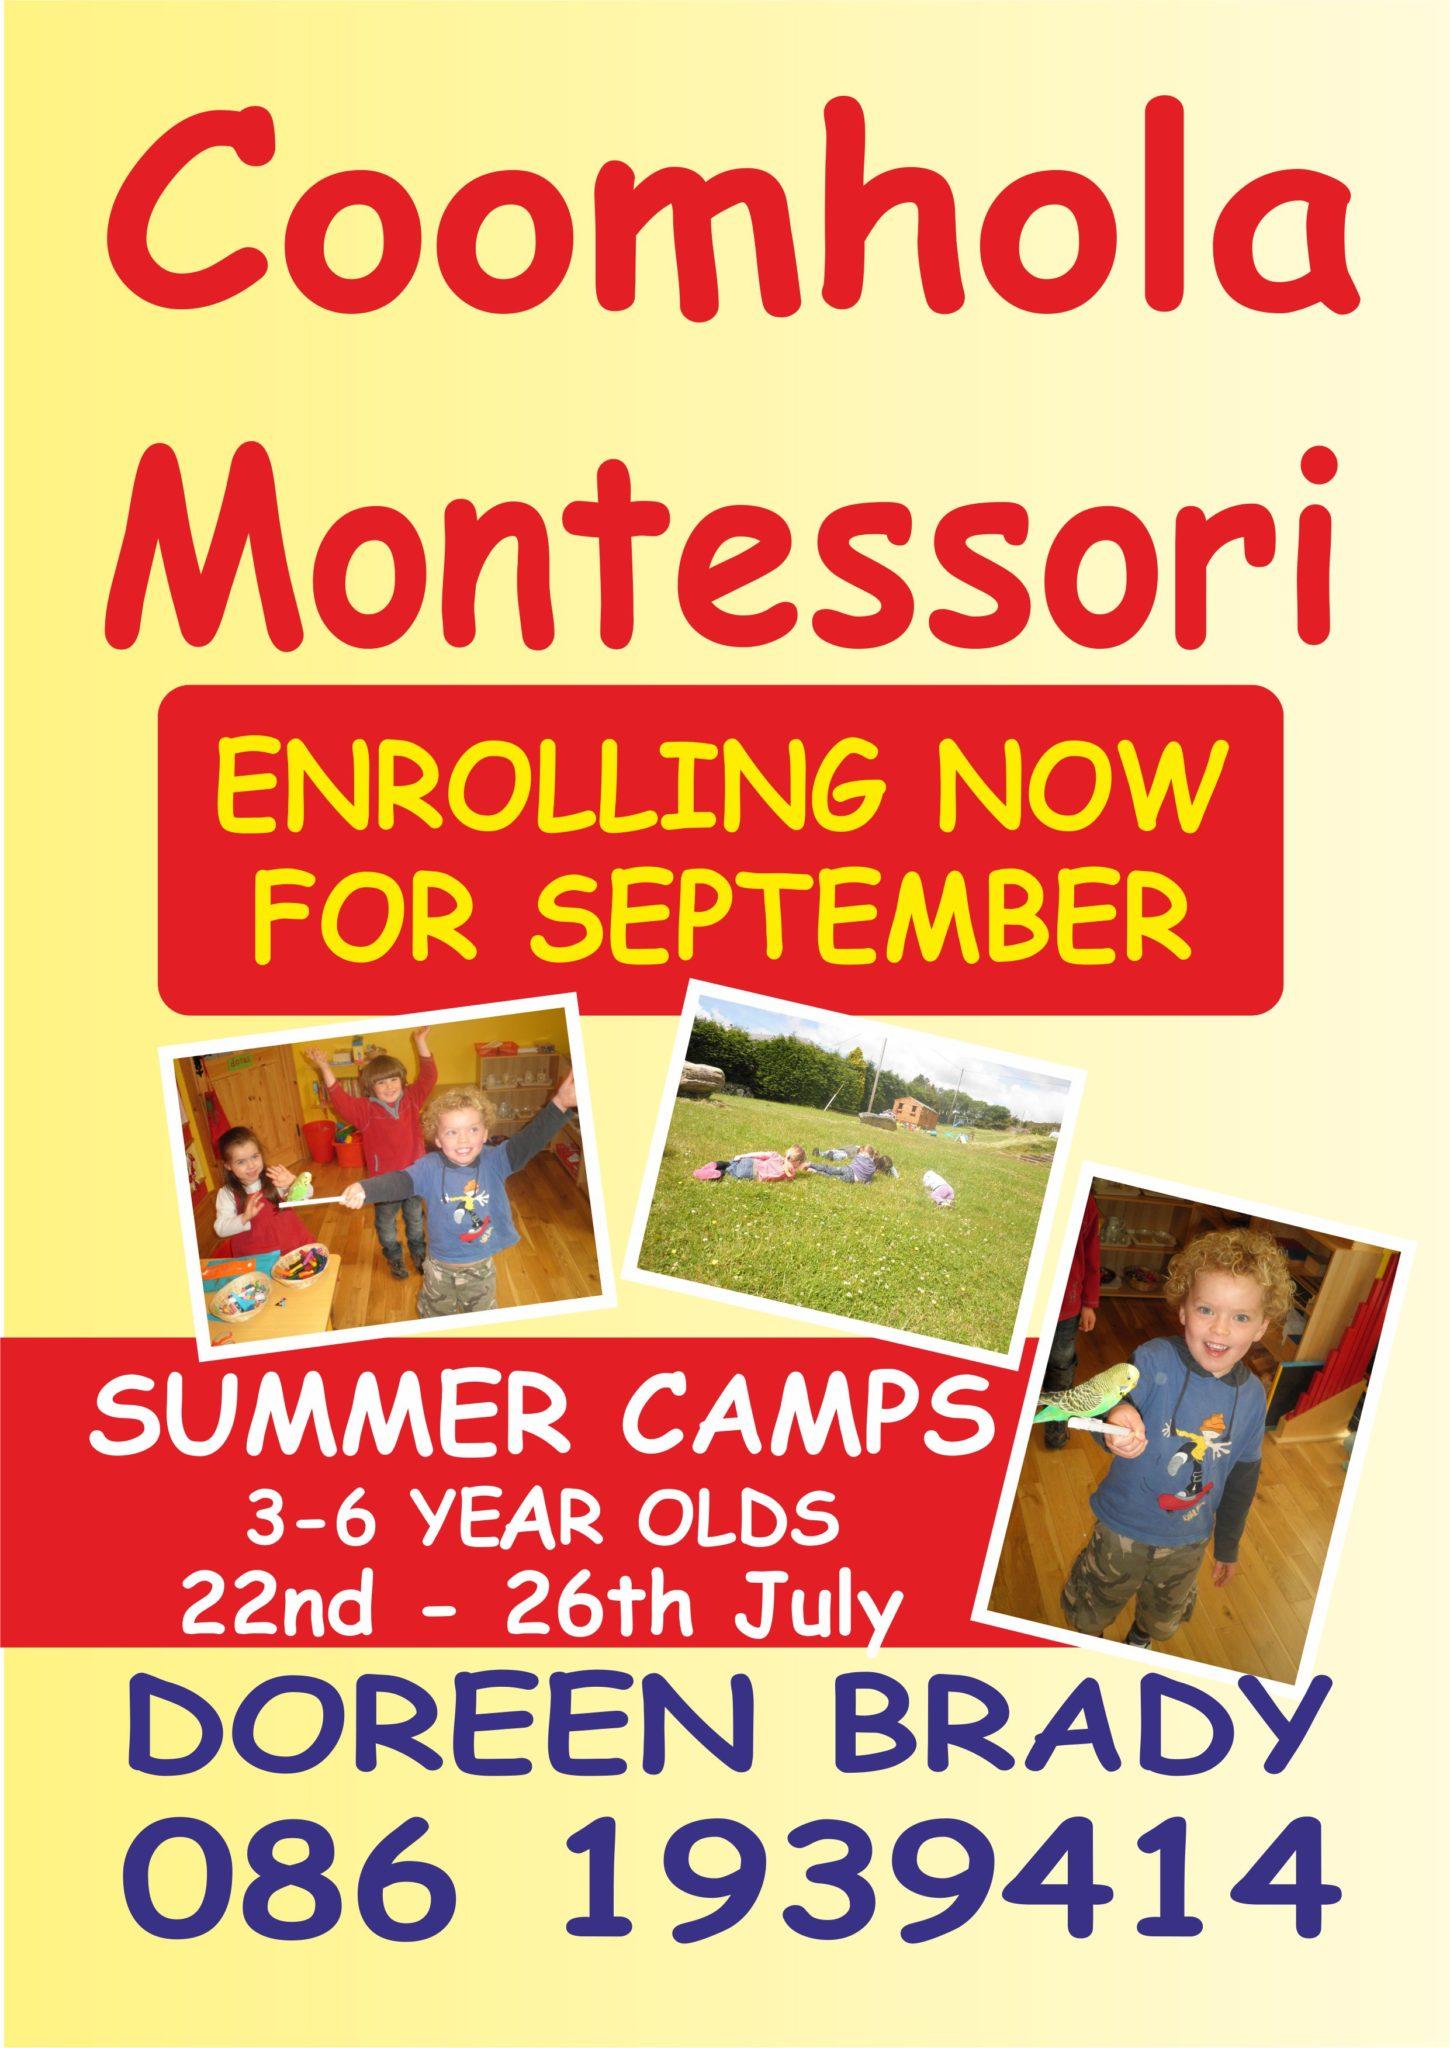 Coomhola Montessori